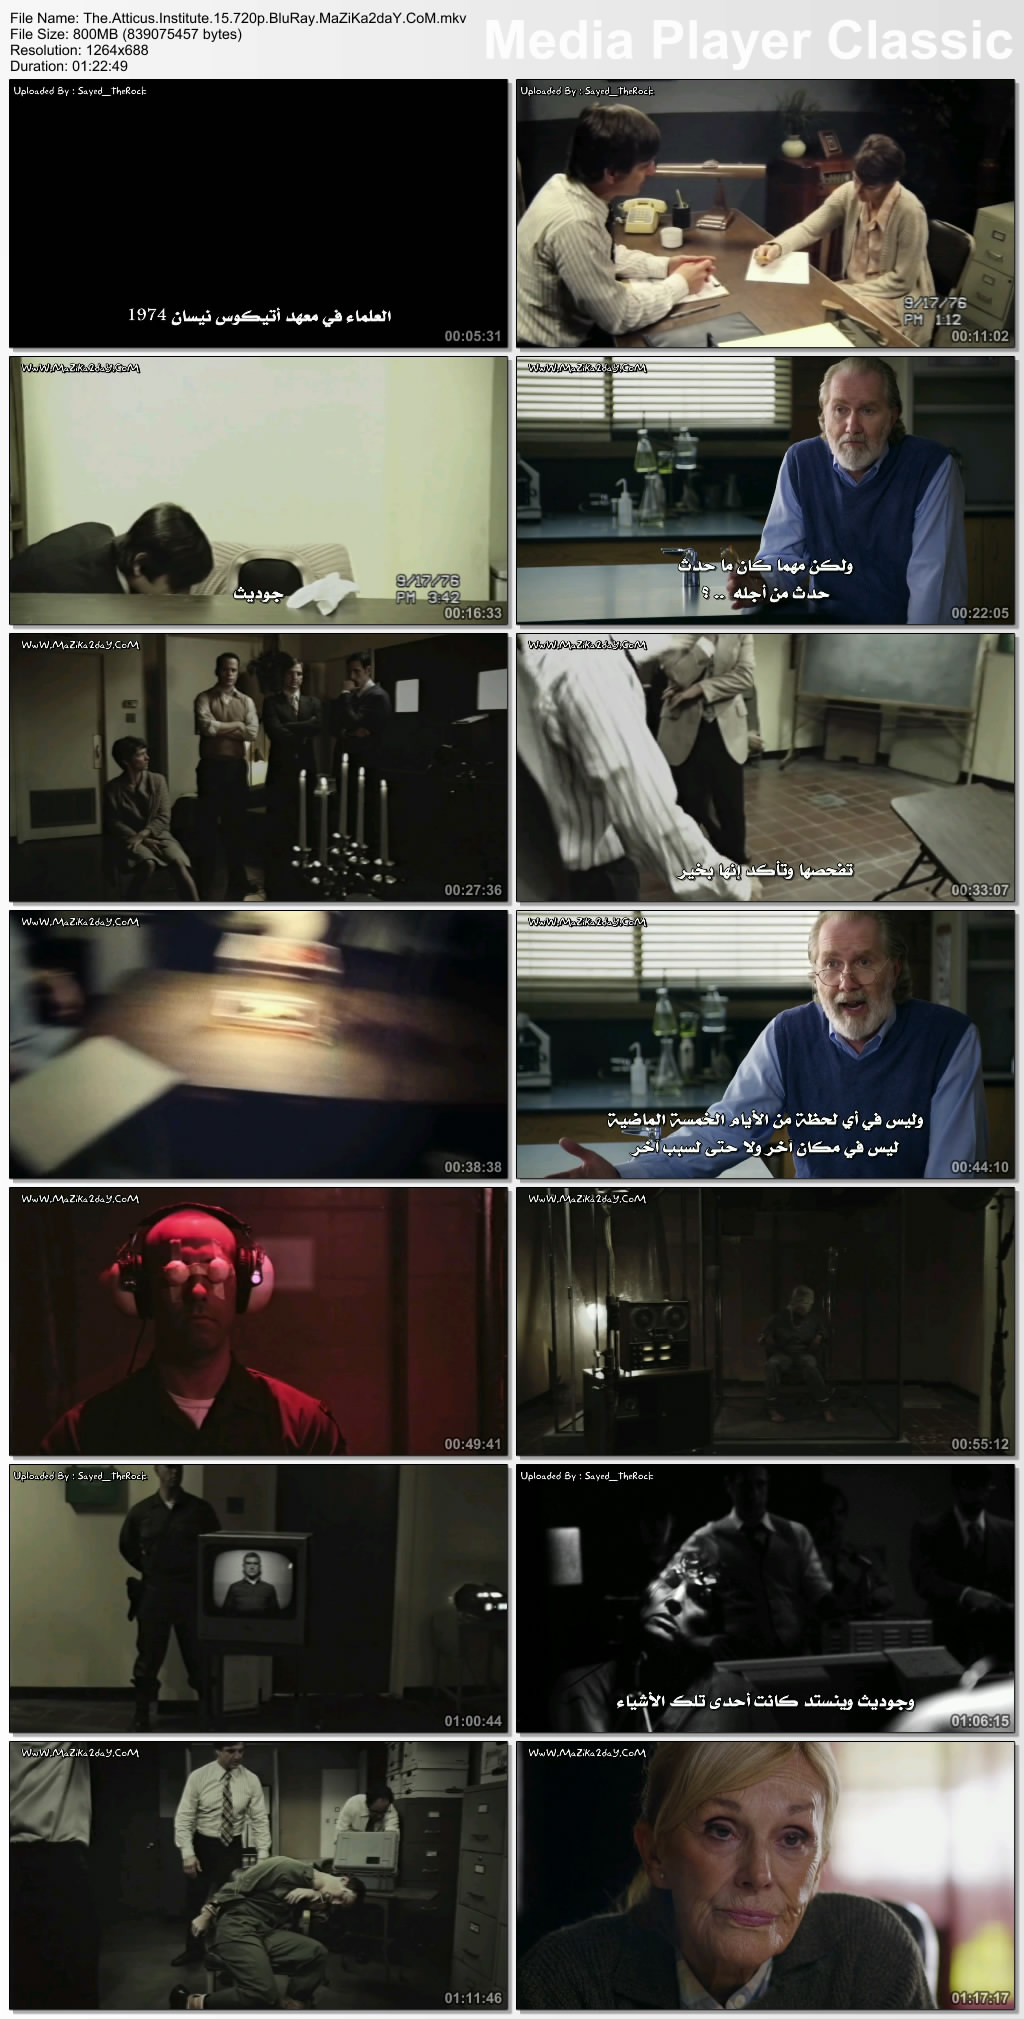 حصرياً فيلم الرعب المُخيف The Atticus Institute مترجم بجودة 720p BluRay تحميل مباشر Image